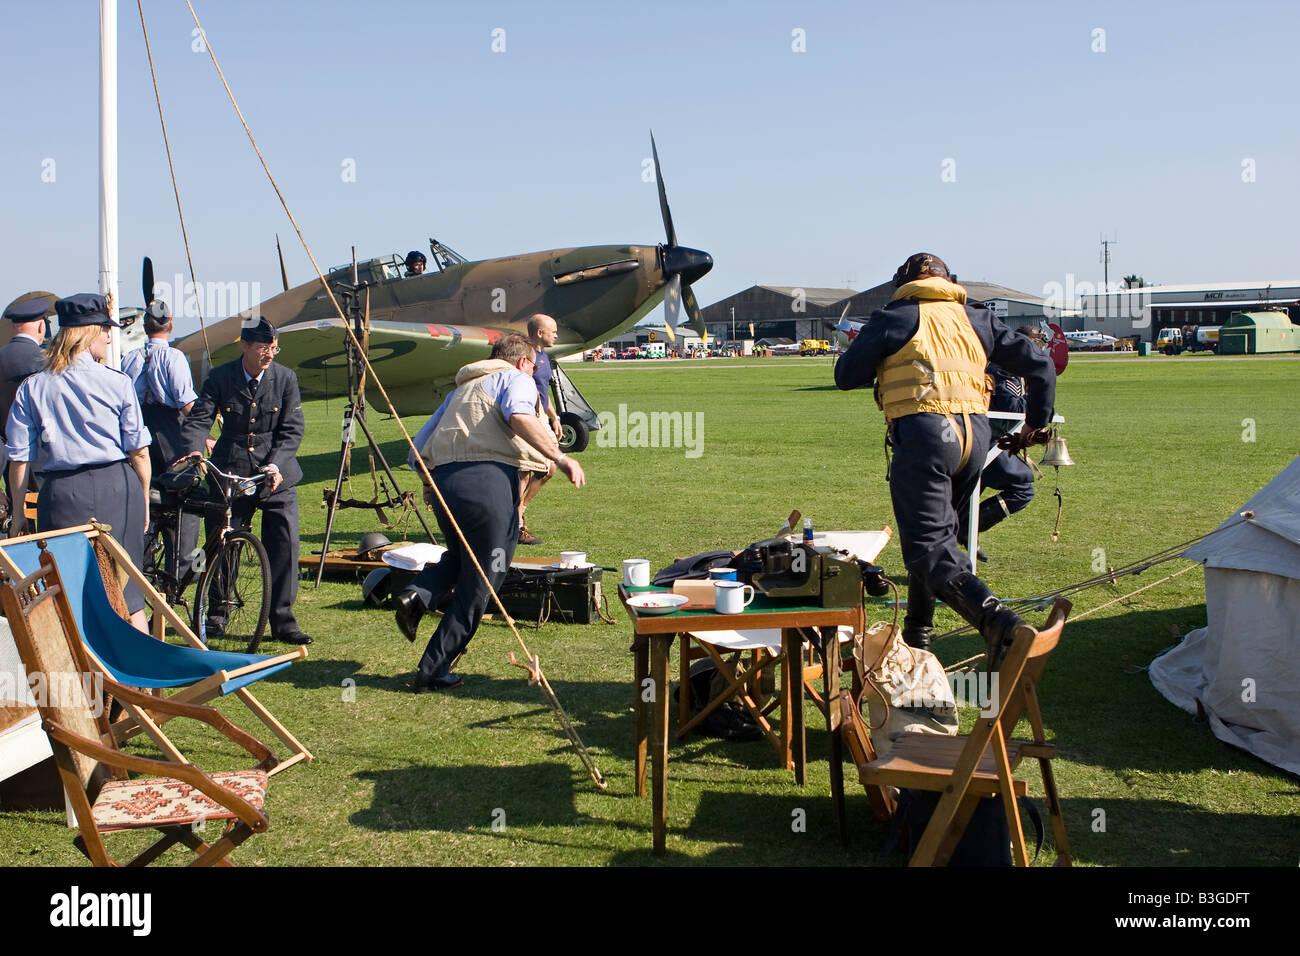 Scramble at RAFA Charity Airshow Shoreham Airport Sussex England - Stock Image